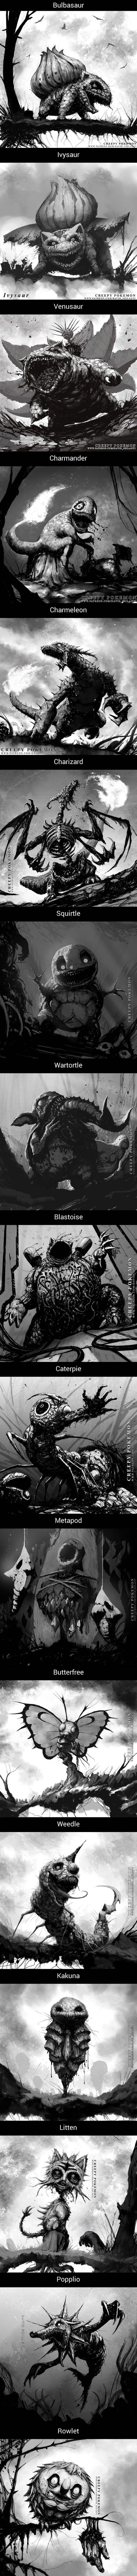 Creepy Pokemon by Artist David Szilagyi